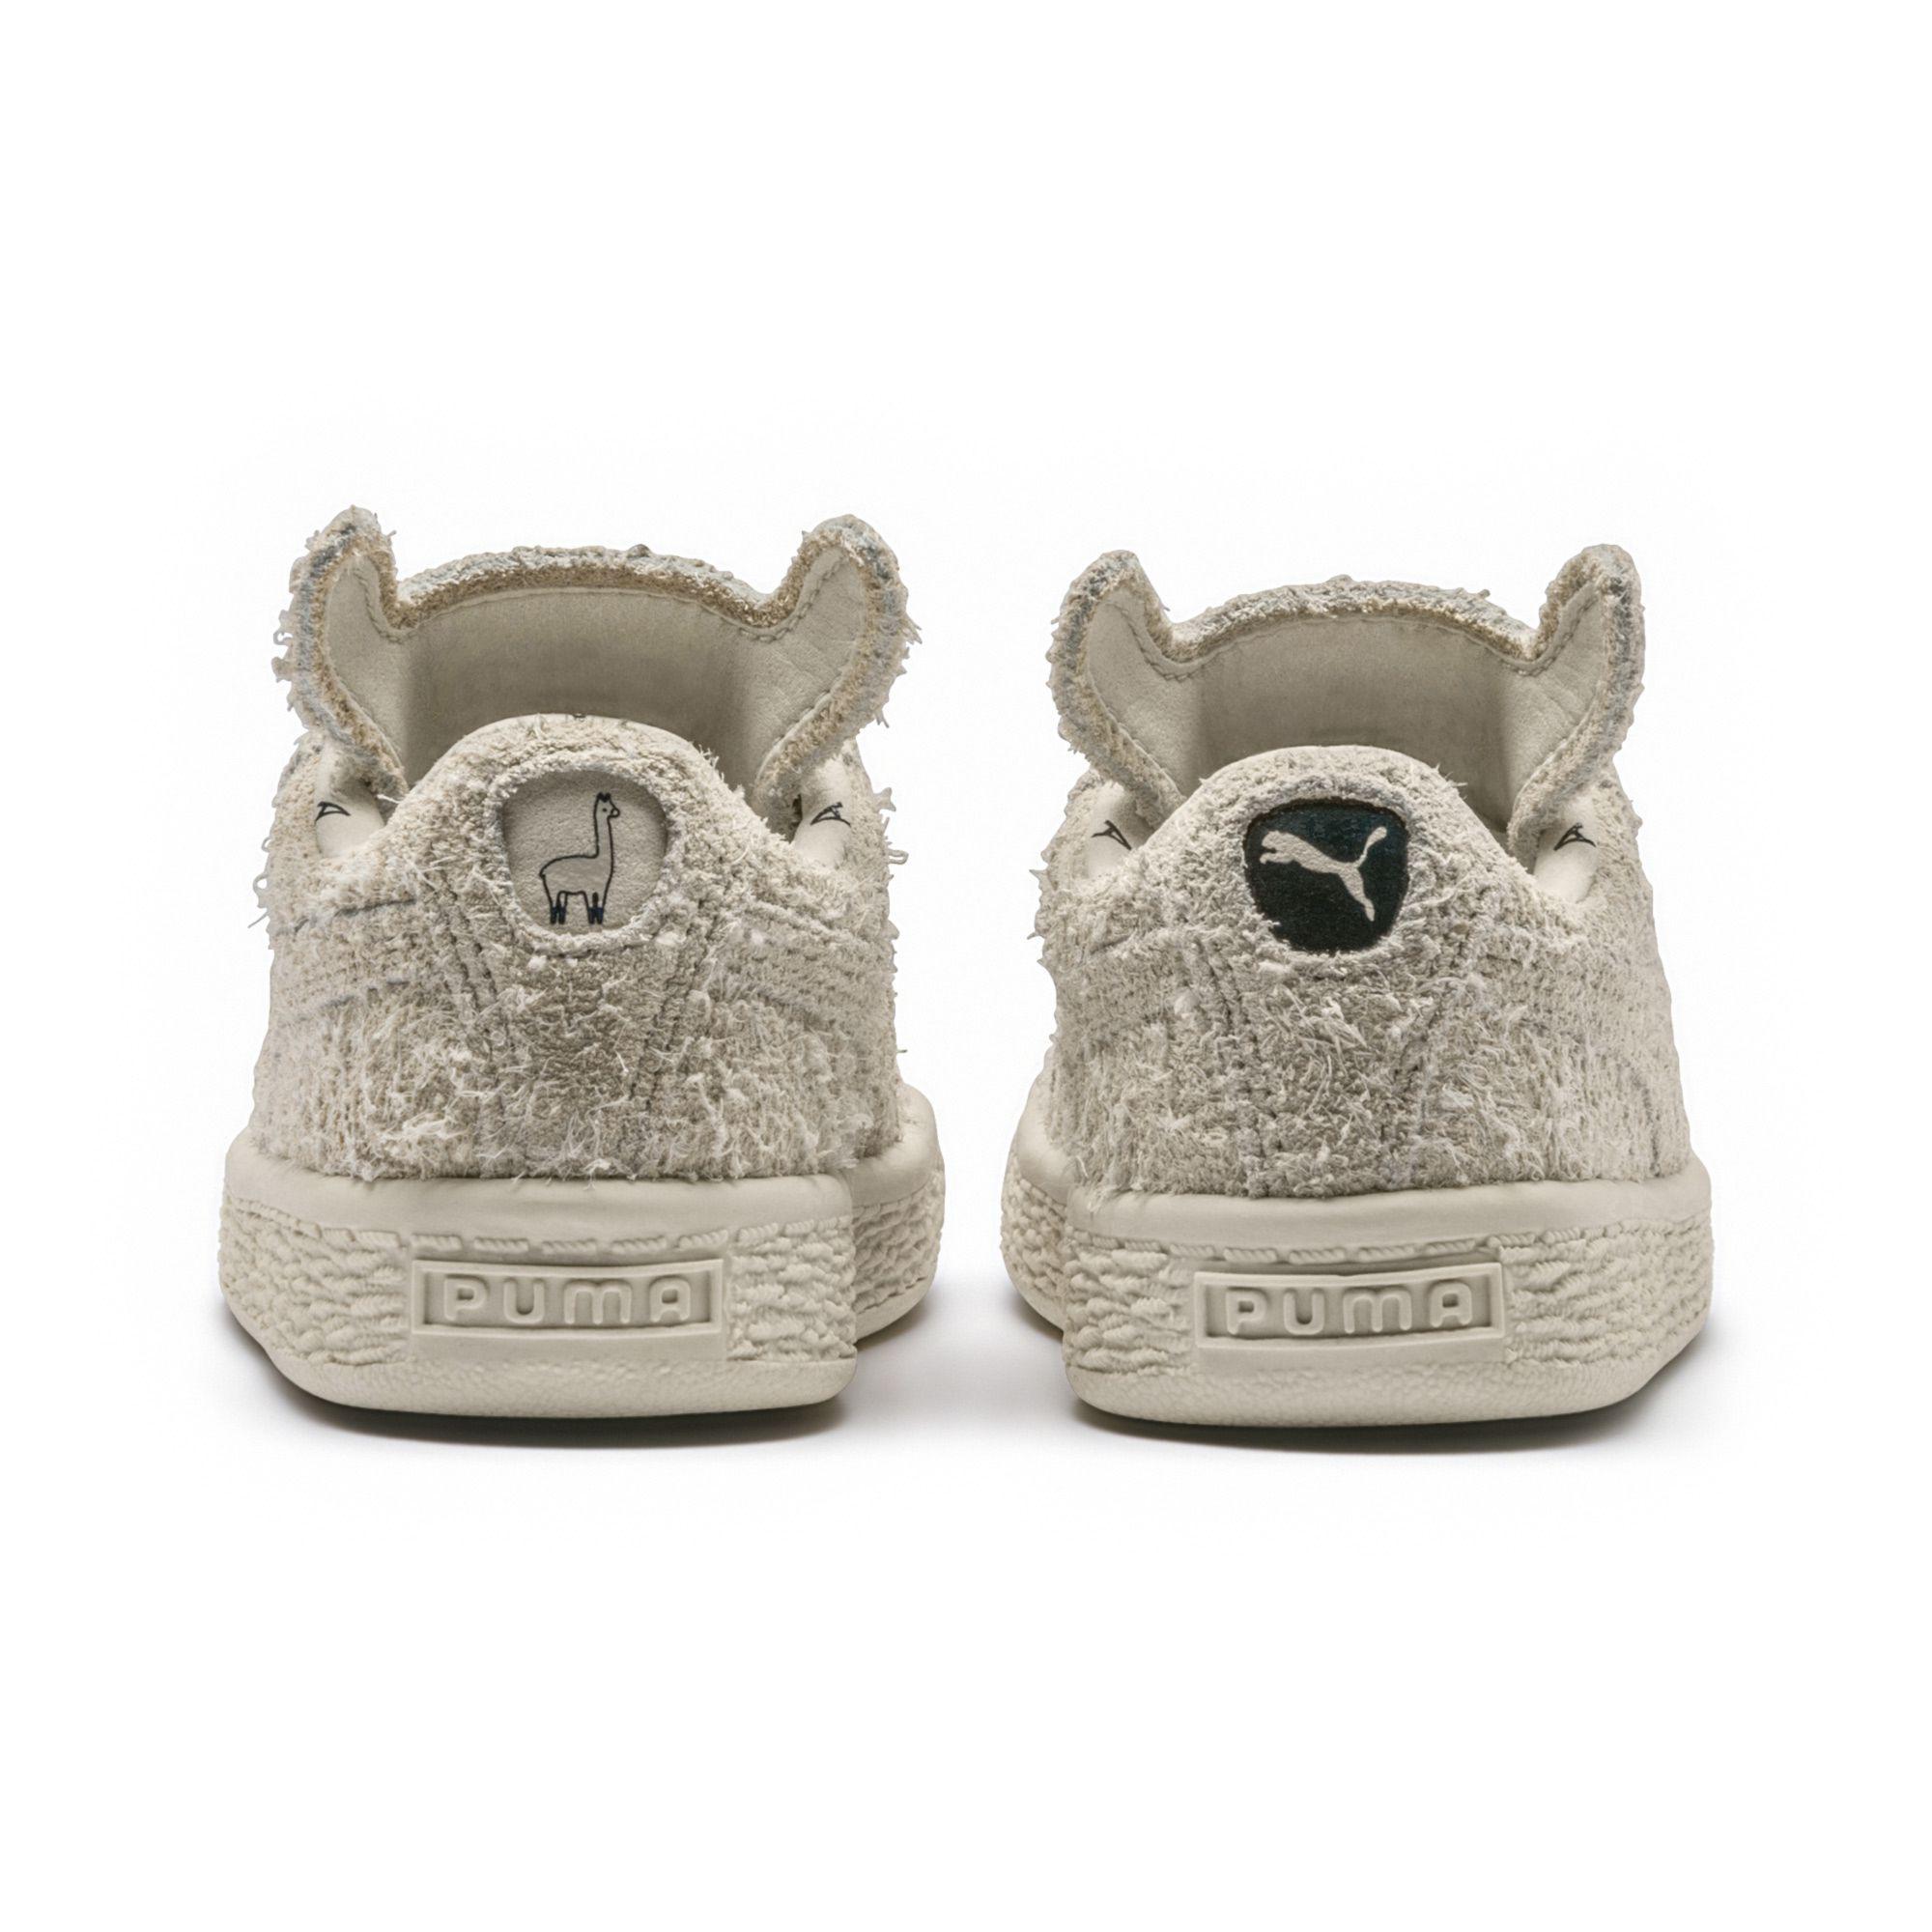 4edb840b8f1 puma-Birch-Dress-Blues-X-Tinycottons-Basket-Furry-Preschool-Sneakers.jpeg